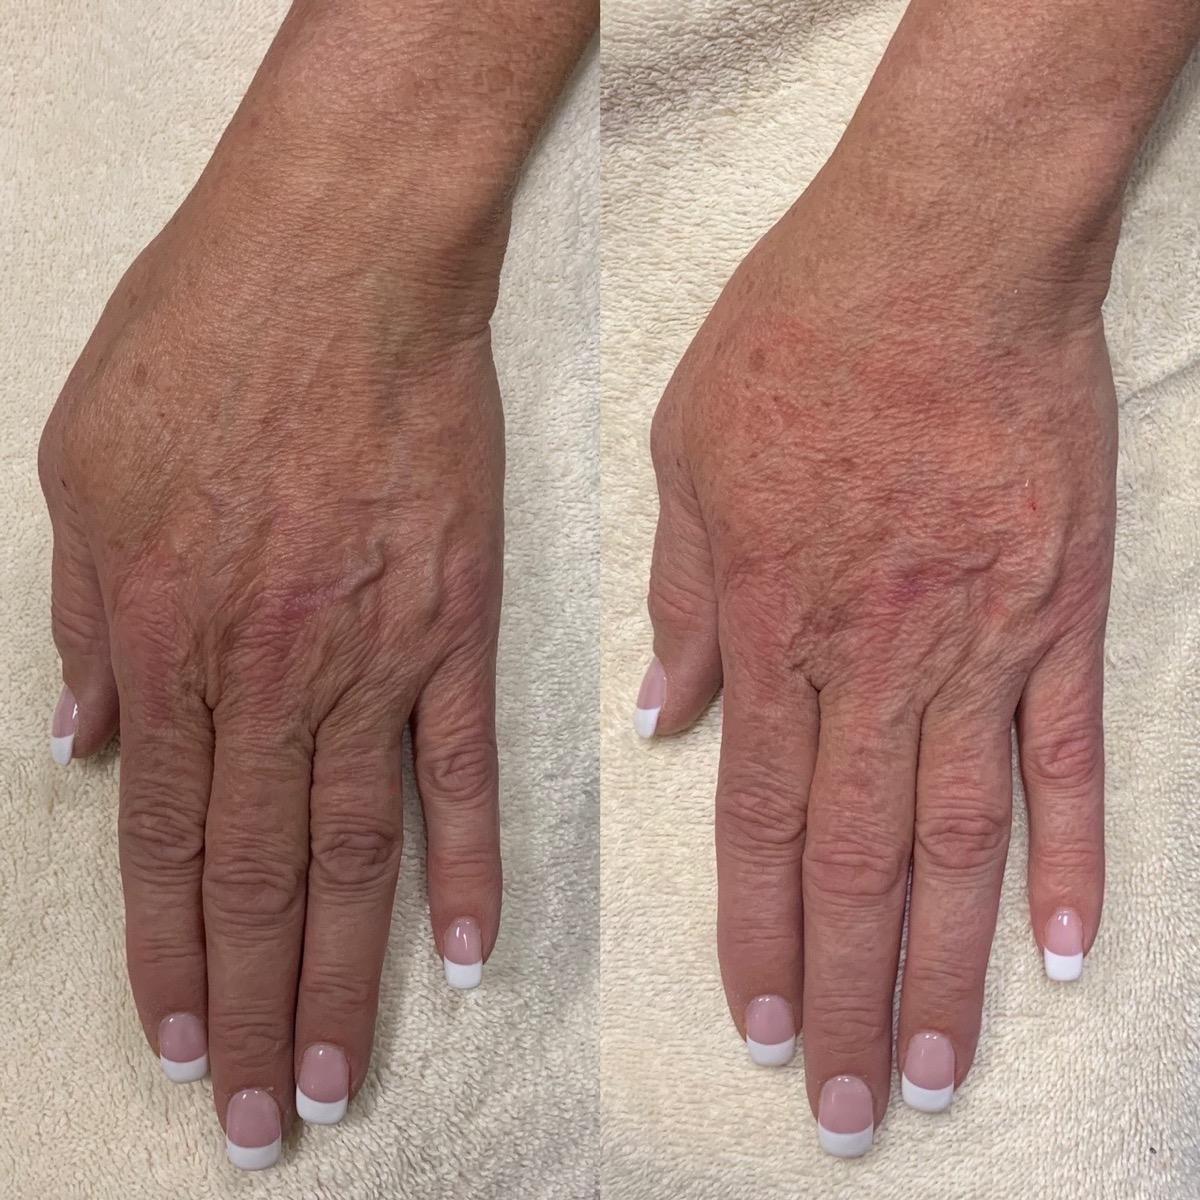 Hand Gallery - Patient 3199417 - Image 3